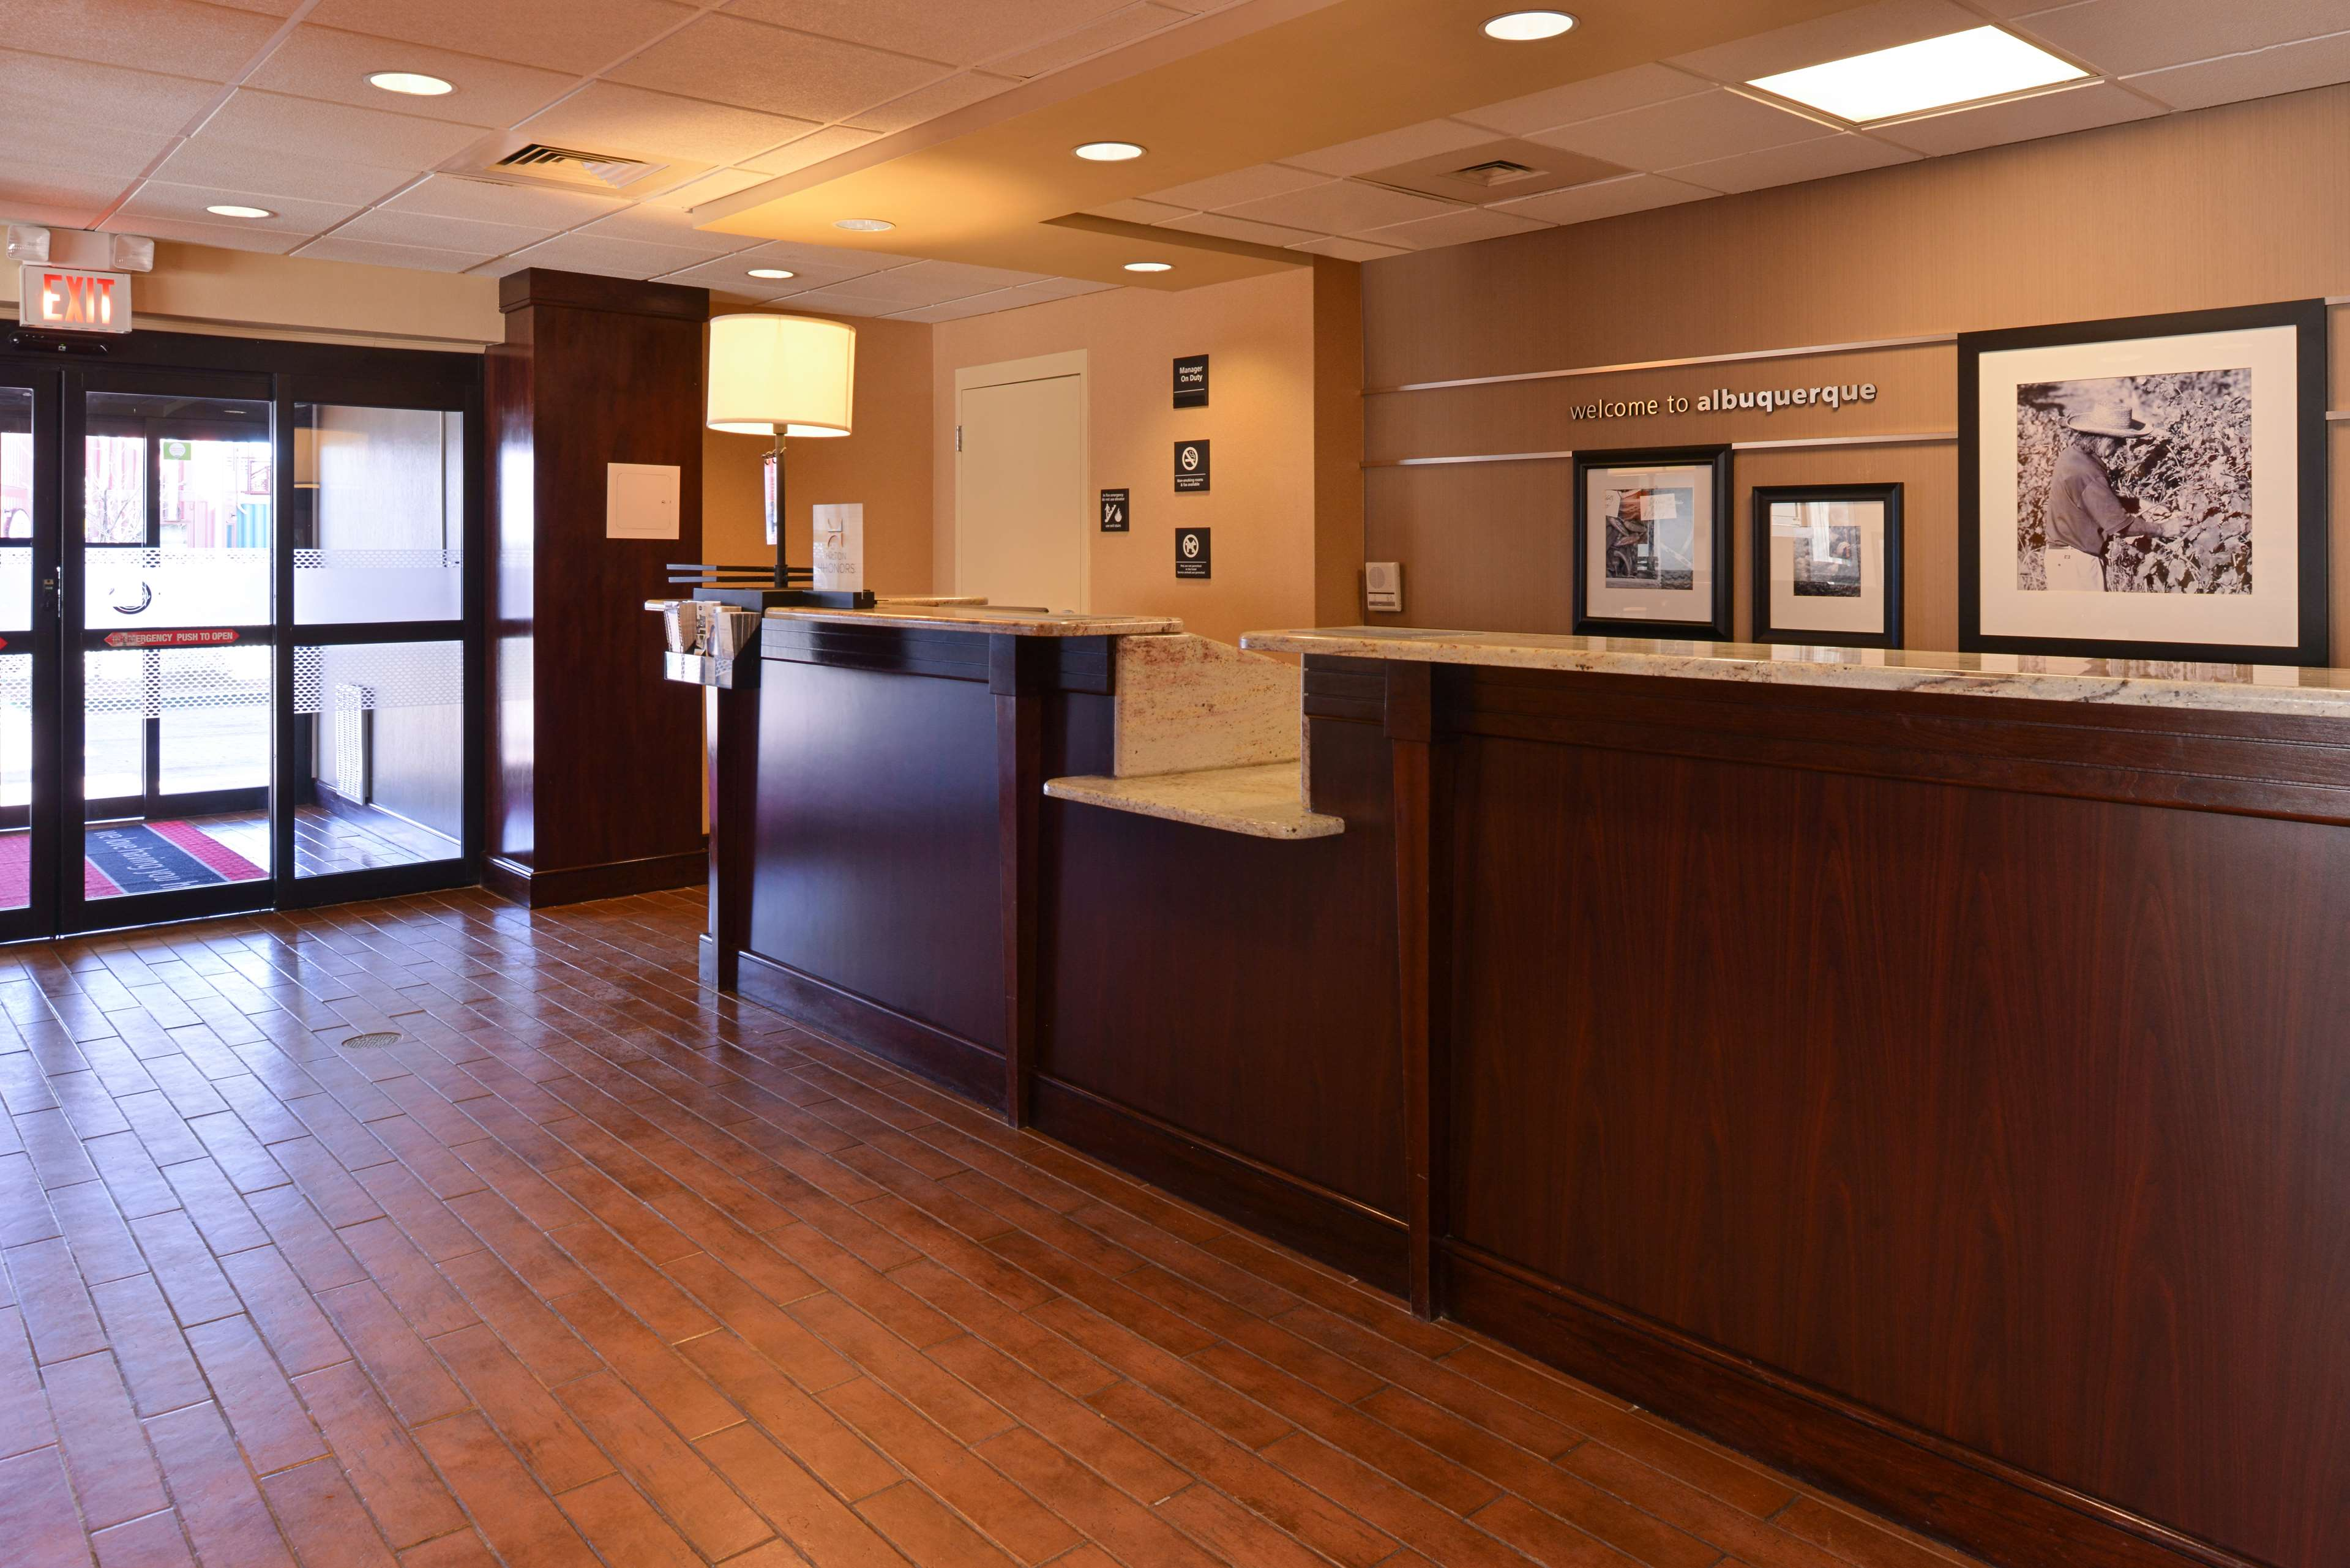 Hampton Inn Albuquerque-University/Midtown image 3